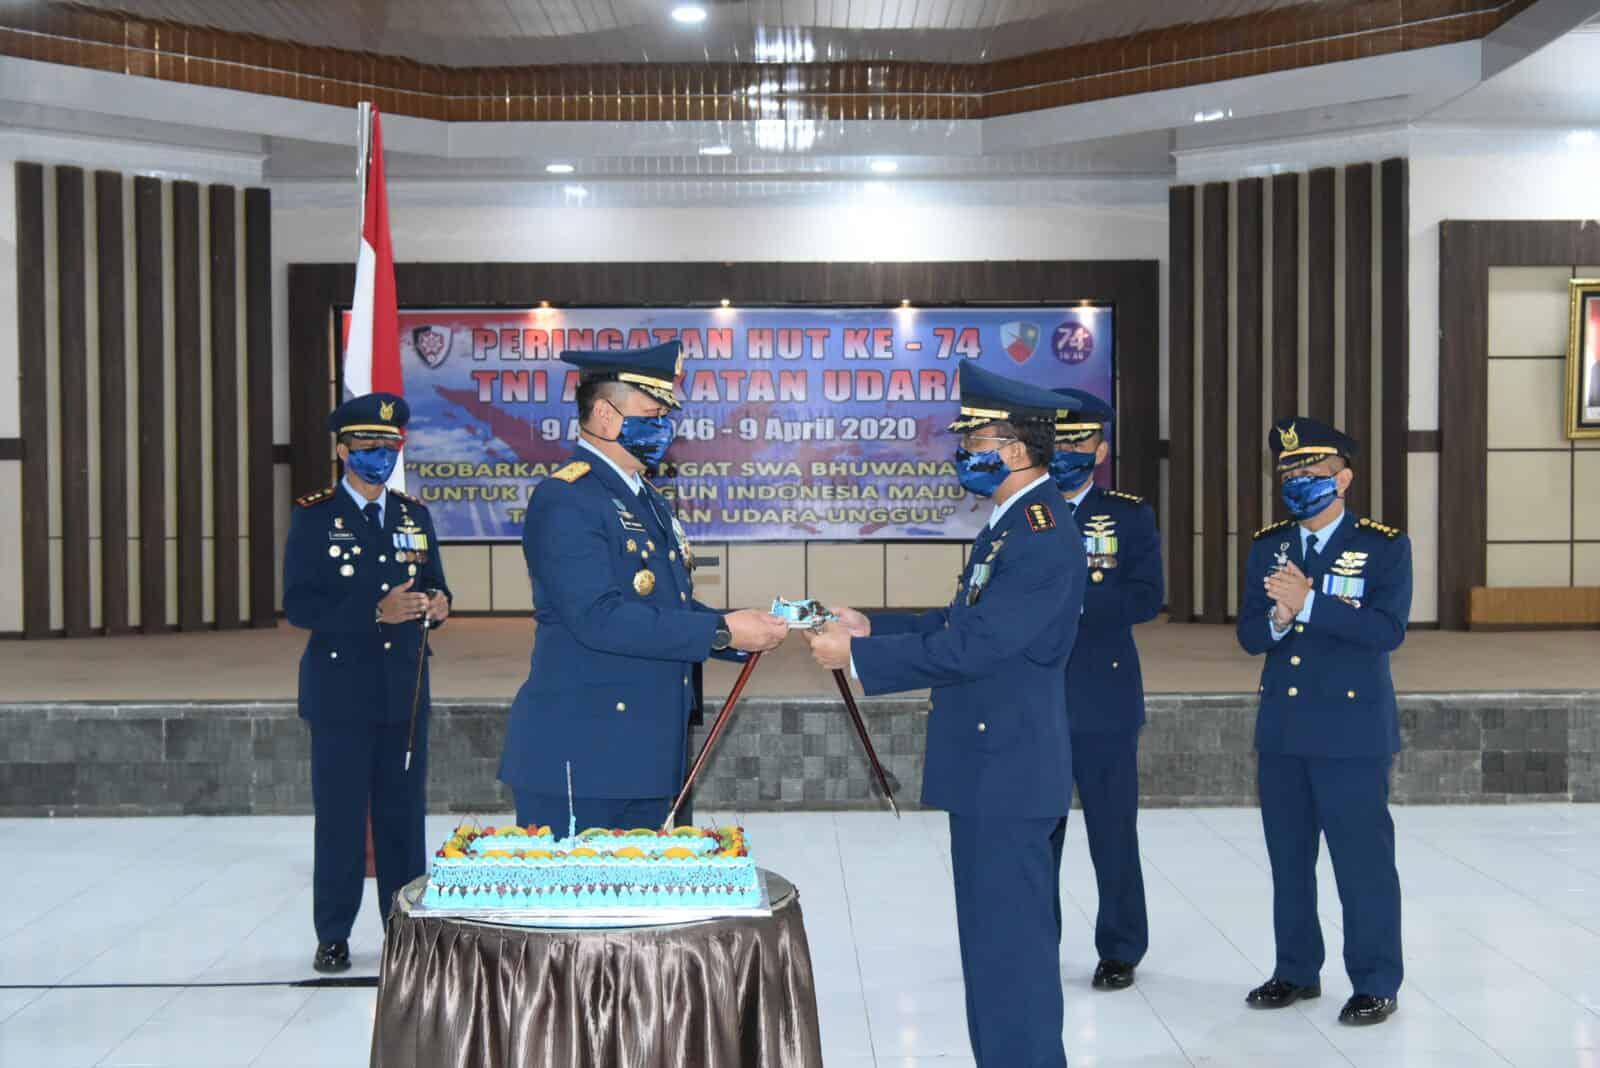 Sempena Hut TNI AU Ke-74 , Lanud Rsn Gelar Upacara Secara Sederhana